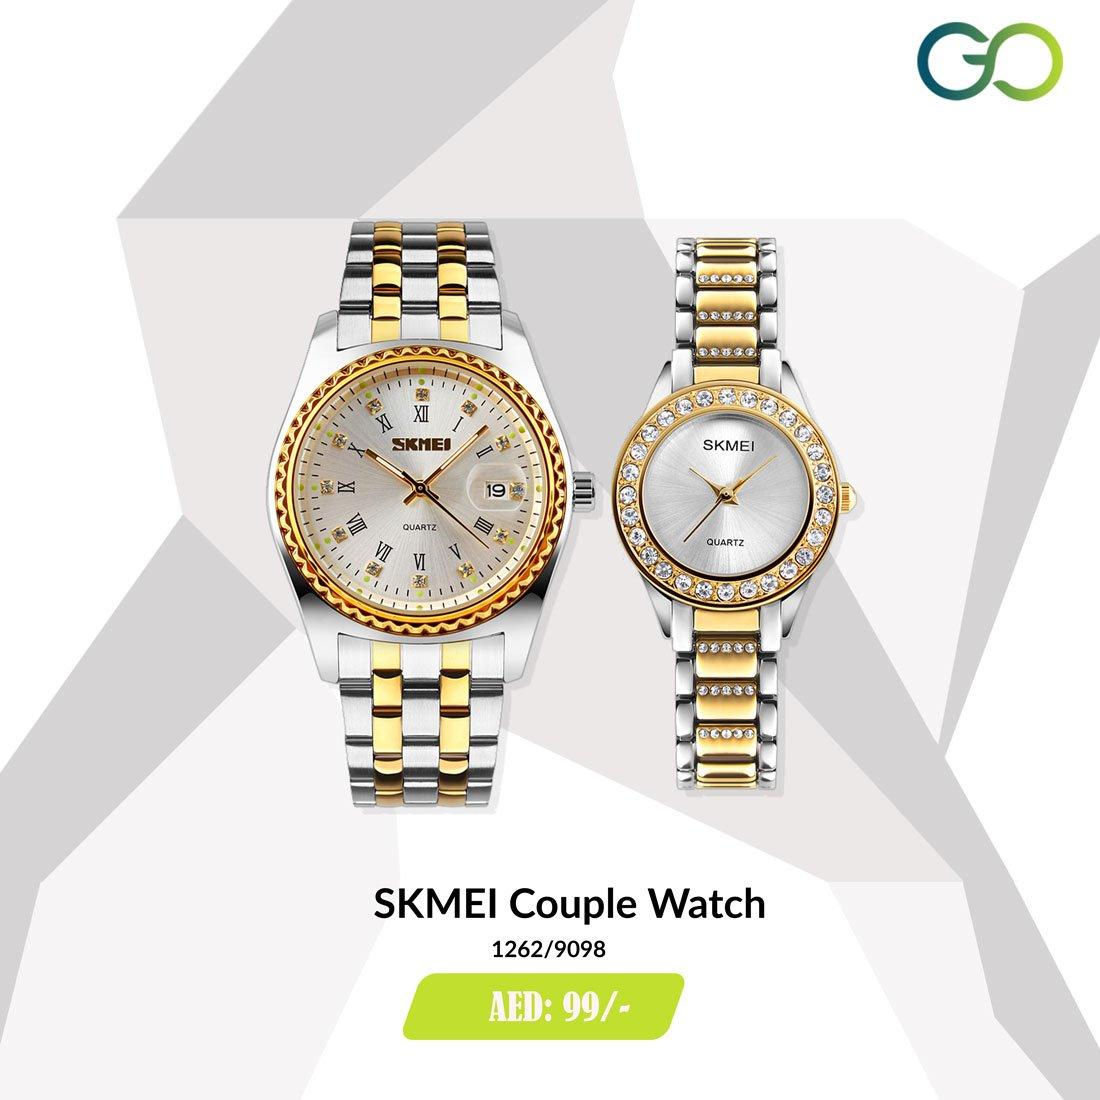 AED99 For Direct Order Googl YsTZMv WhatsApp 971585009191 Couple Wristwatch Fashion Style Trend Dubaishopping UAE DXB